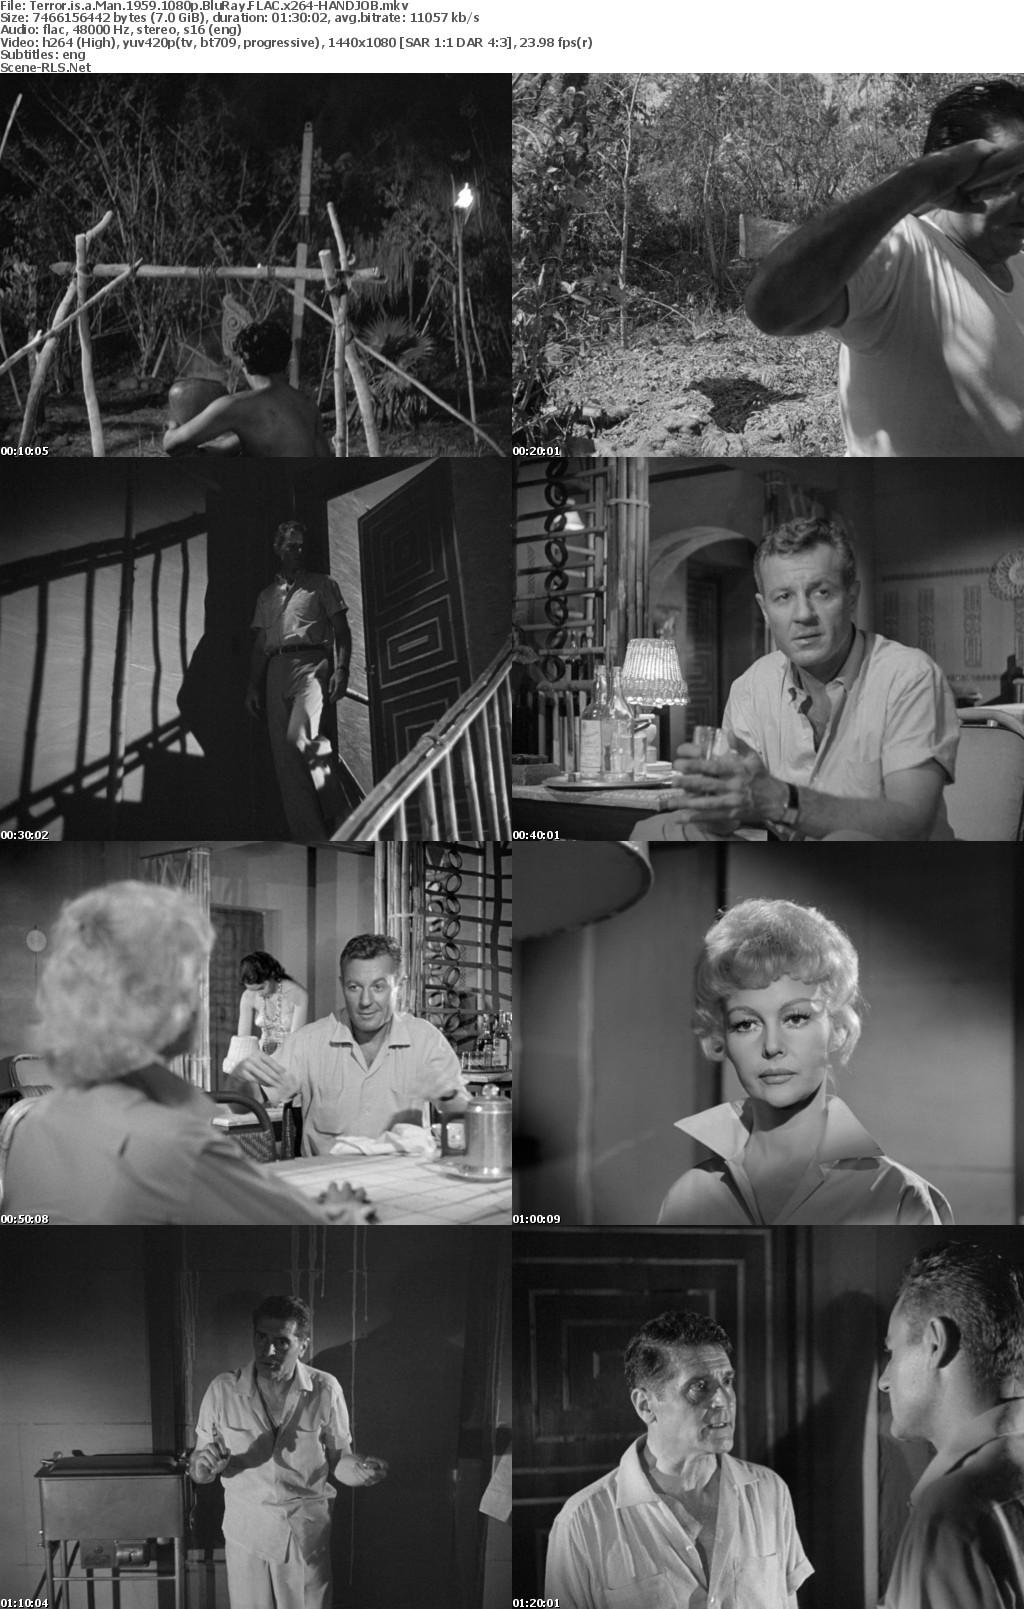 Terror is a Man 1959 1080p BluRay x264-HANDJOB - Scene Release